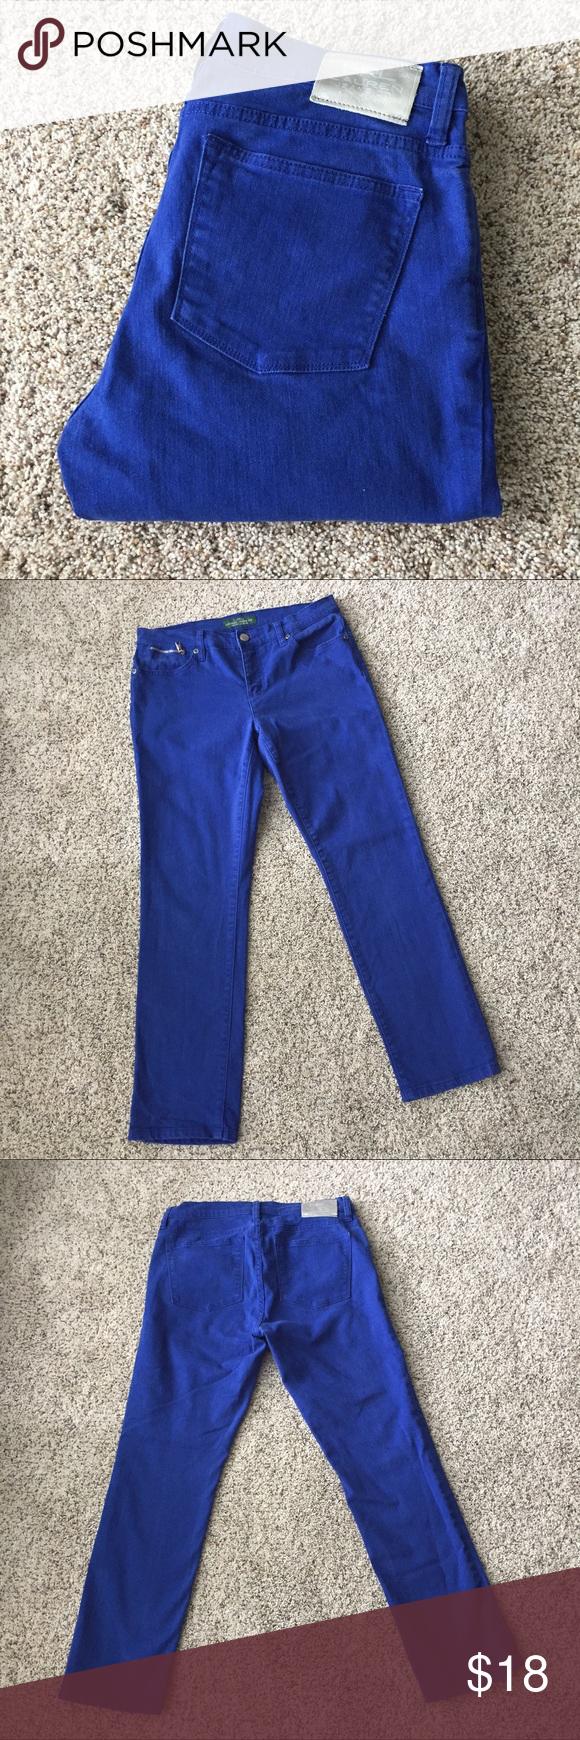 "cobalt blue jeans ✨new listing✨Beautiful cobalt blue jeans by Lauren Ralph Lauren. Zip & button closure. Pockets front & back. Silvertone hardware. Modern straight leg/ankle fit. 98% cotton, 2% elastane. Fits true to sz 8. Measures 37"" top to bottom with 16"" waist, 28"" inseam and 9"" rise. Excellent condition! Lauren Ralph Lauren Jeans"